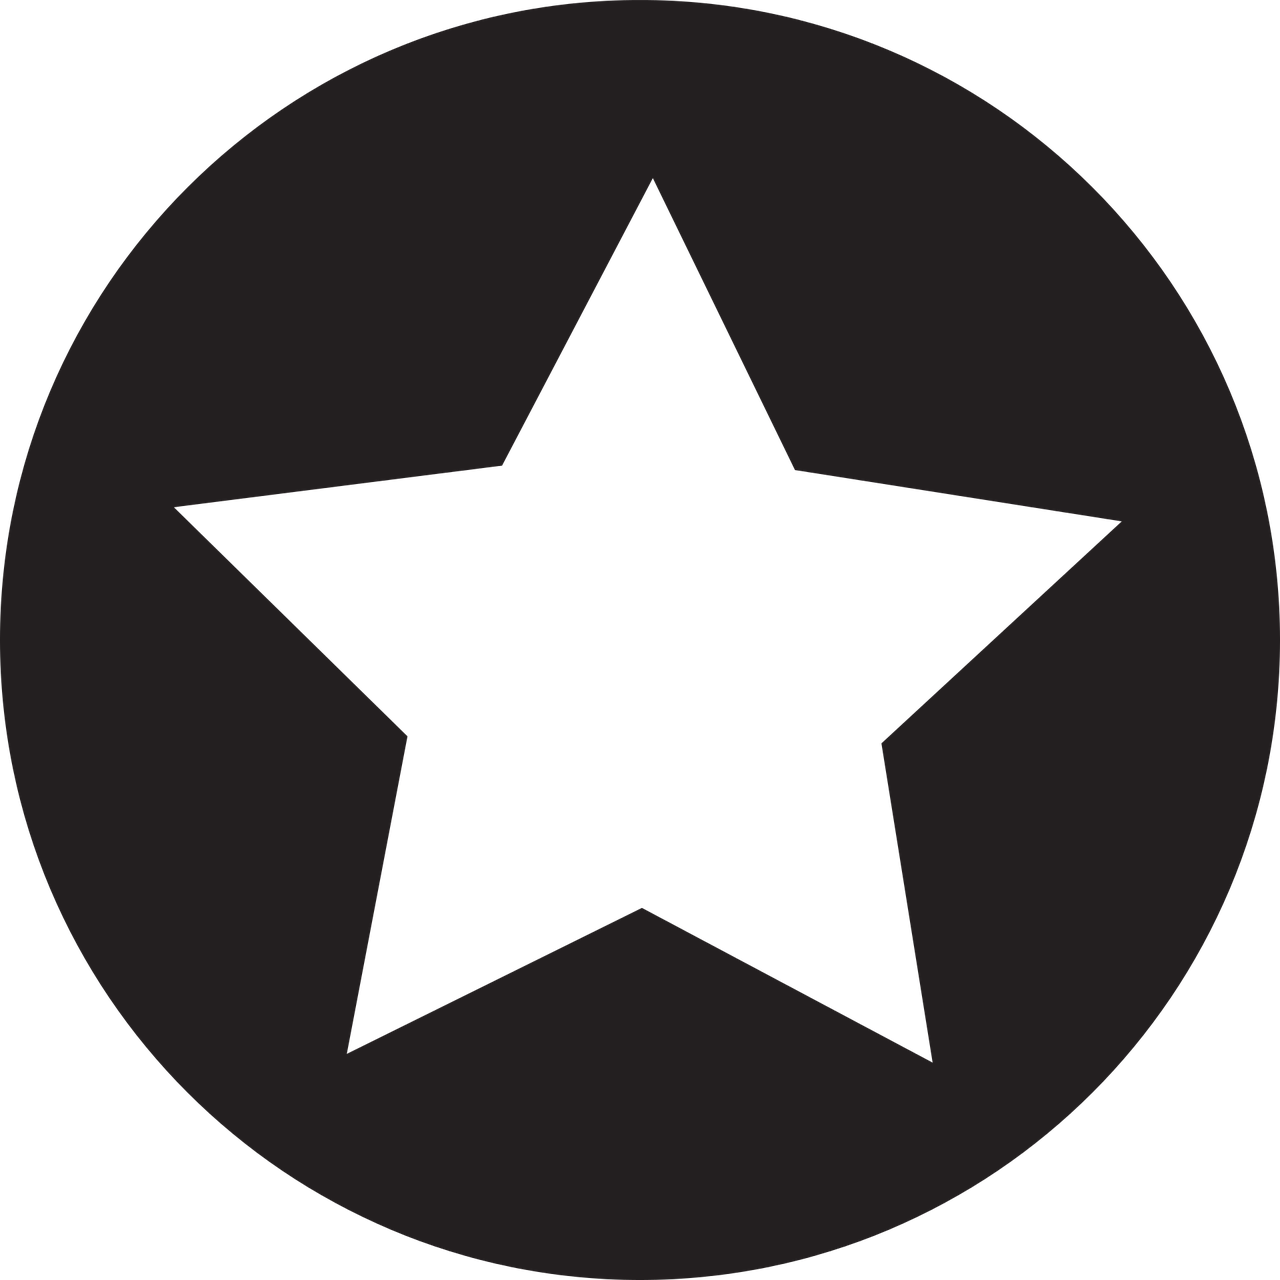 star, icon, flat